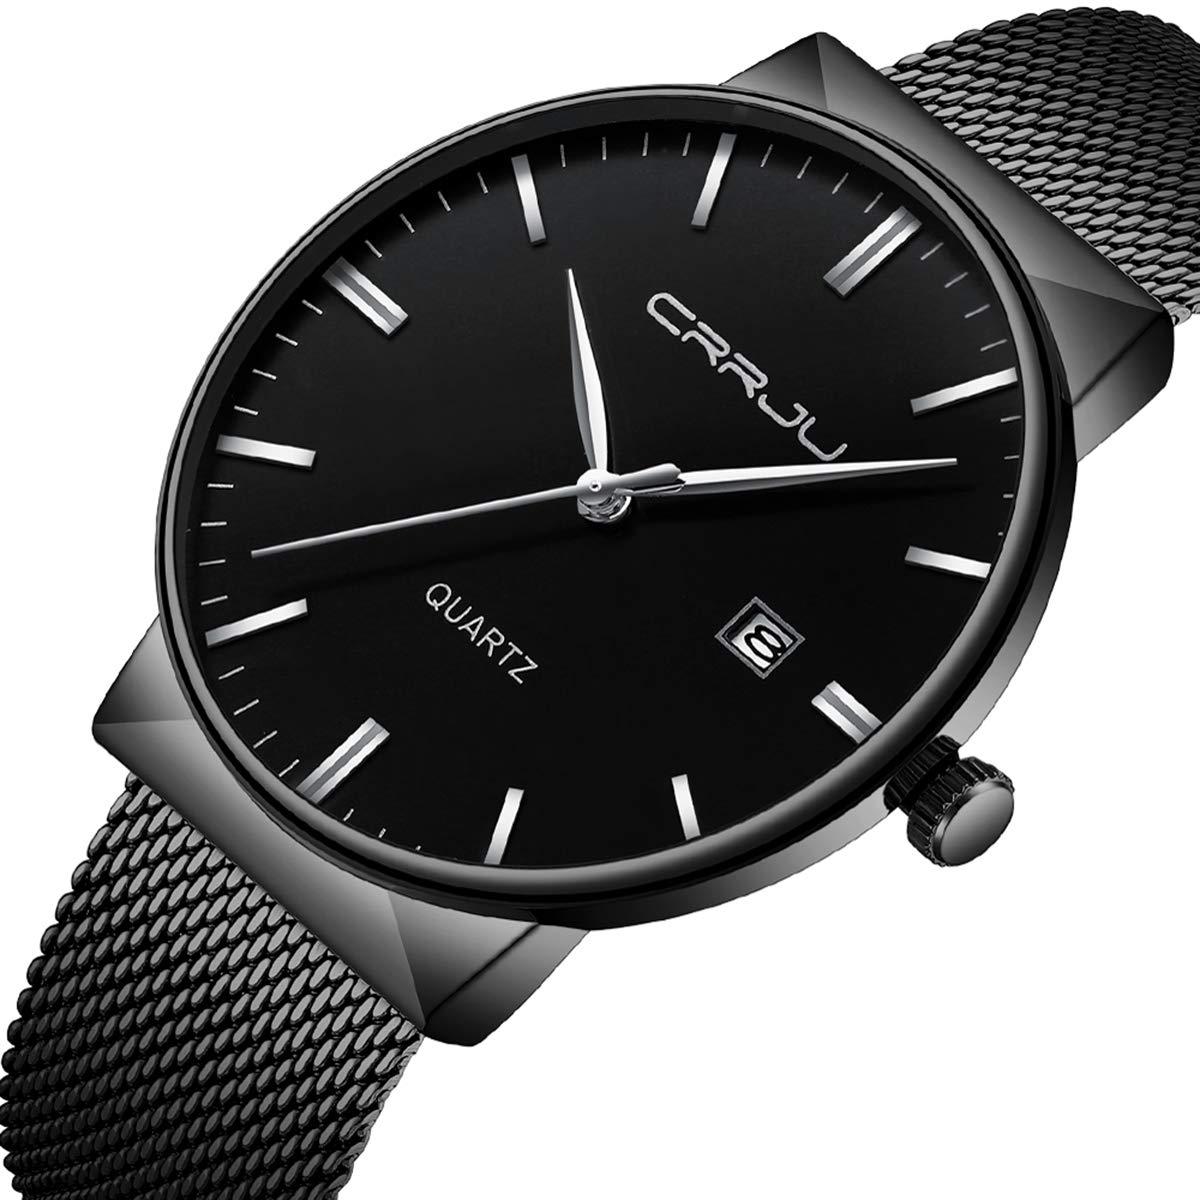 Discreet Luxury Women Bracelet Watches Stainless Steel Mesh Band Sports Business Quartz Wrist Watch Casual Ladies Girls Dress Clock Usps Yet Not Vulgar Watches Men's Watches